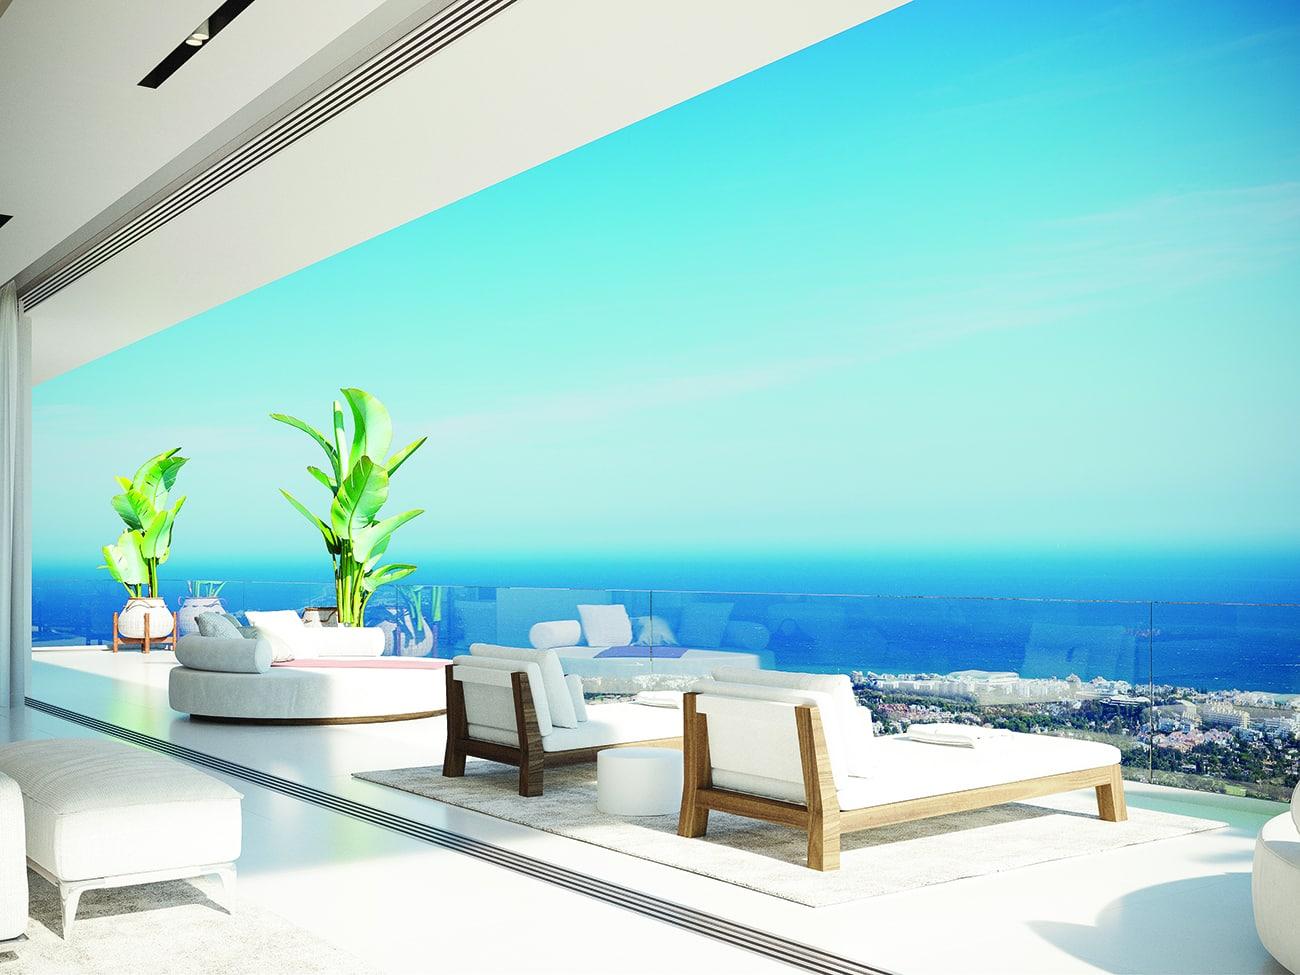 The master bedroom terrace enjoys fabulous views over the Mediterranean